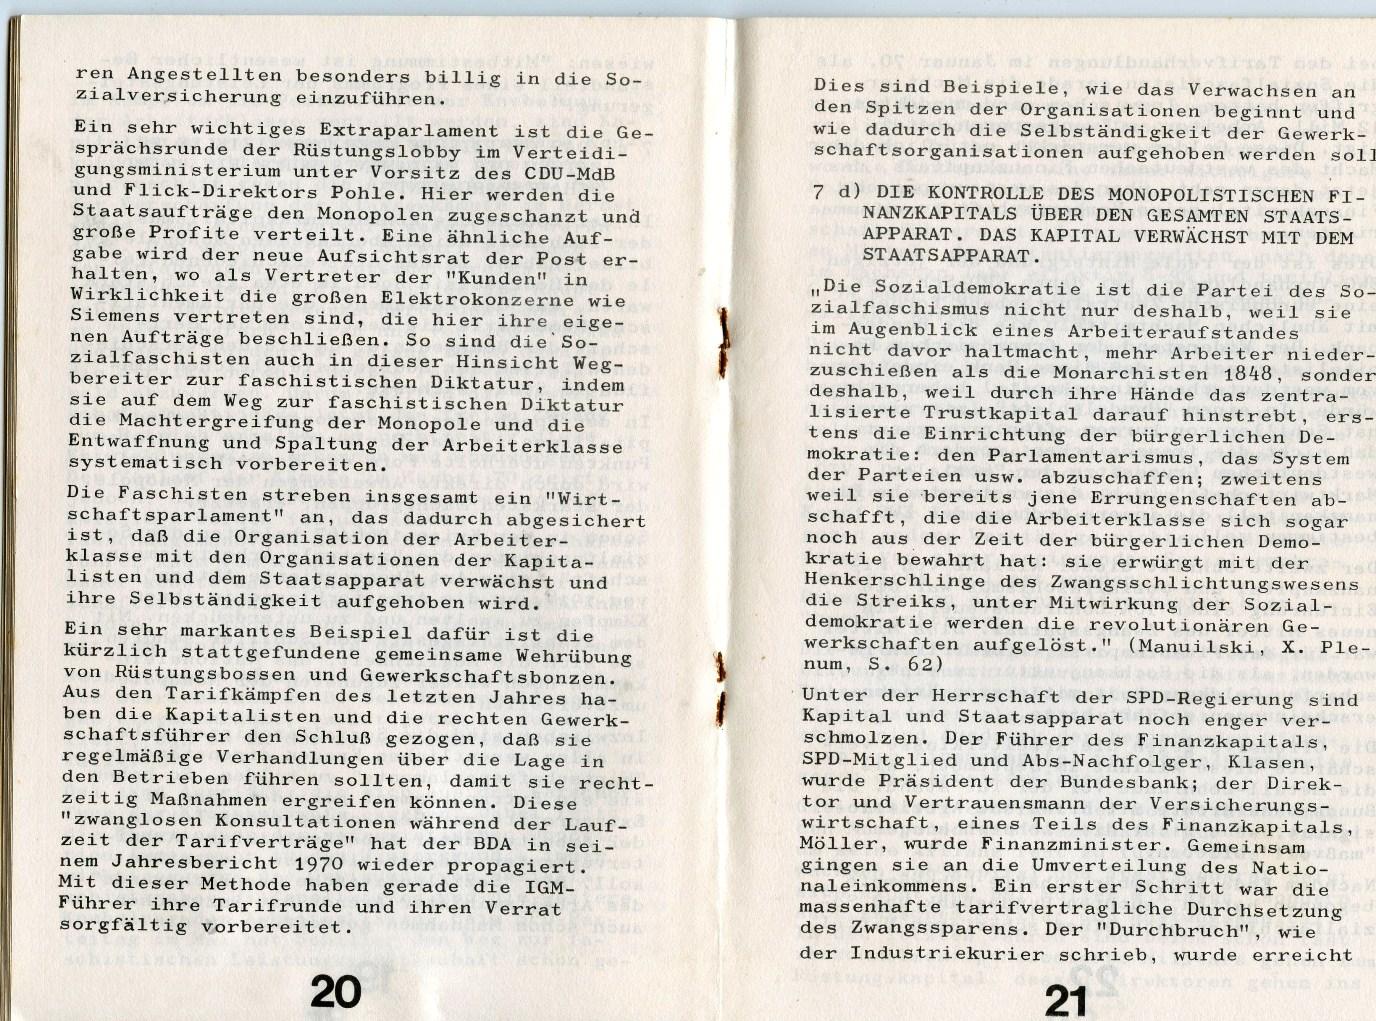 KJVD_Sozialdemokratie_Sozialfaschismus_1971_12